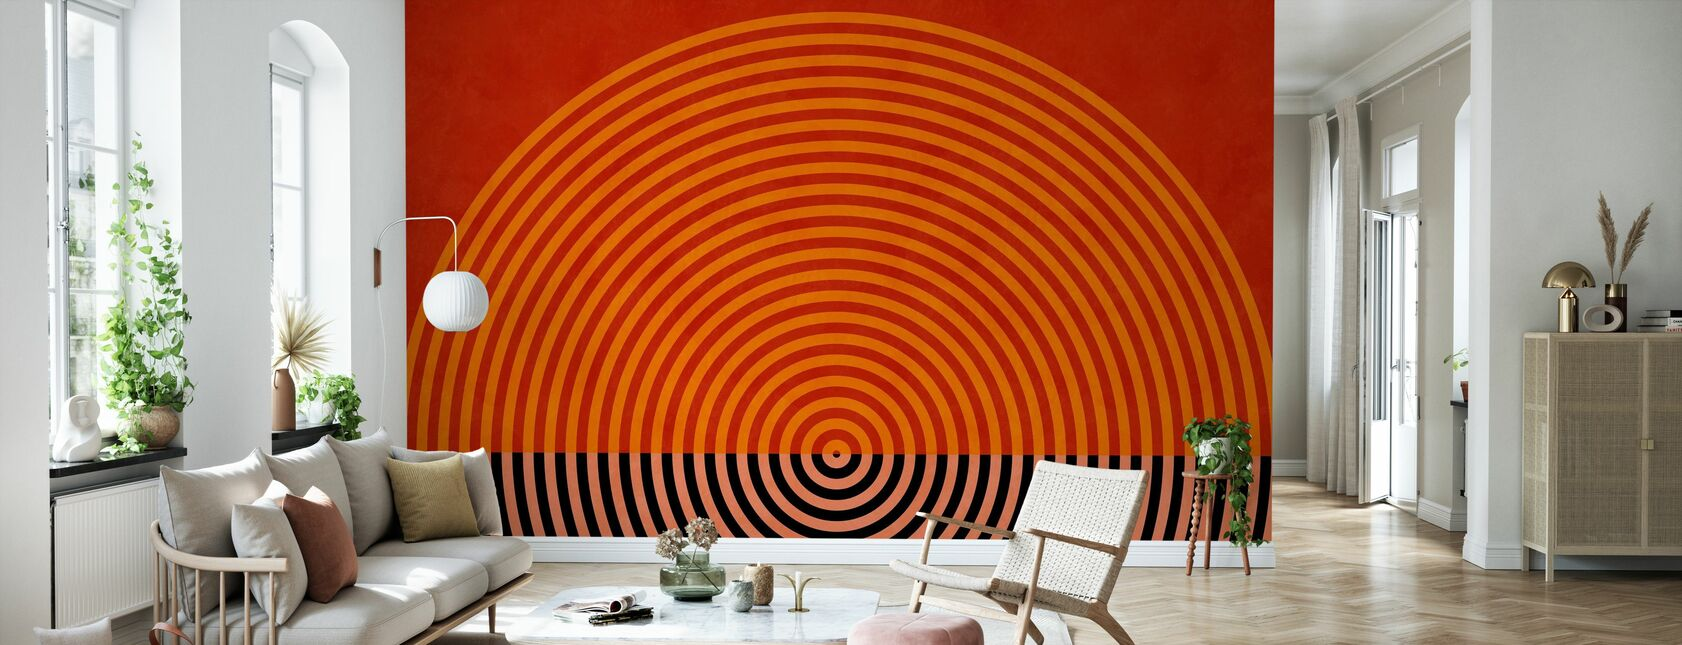 Circles Mid Century XI - Wallpaper - Living Room